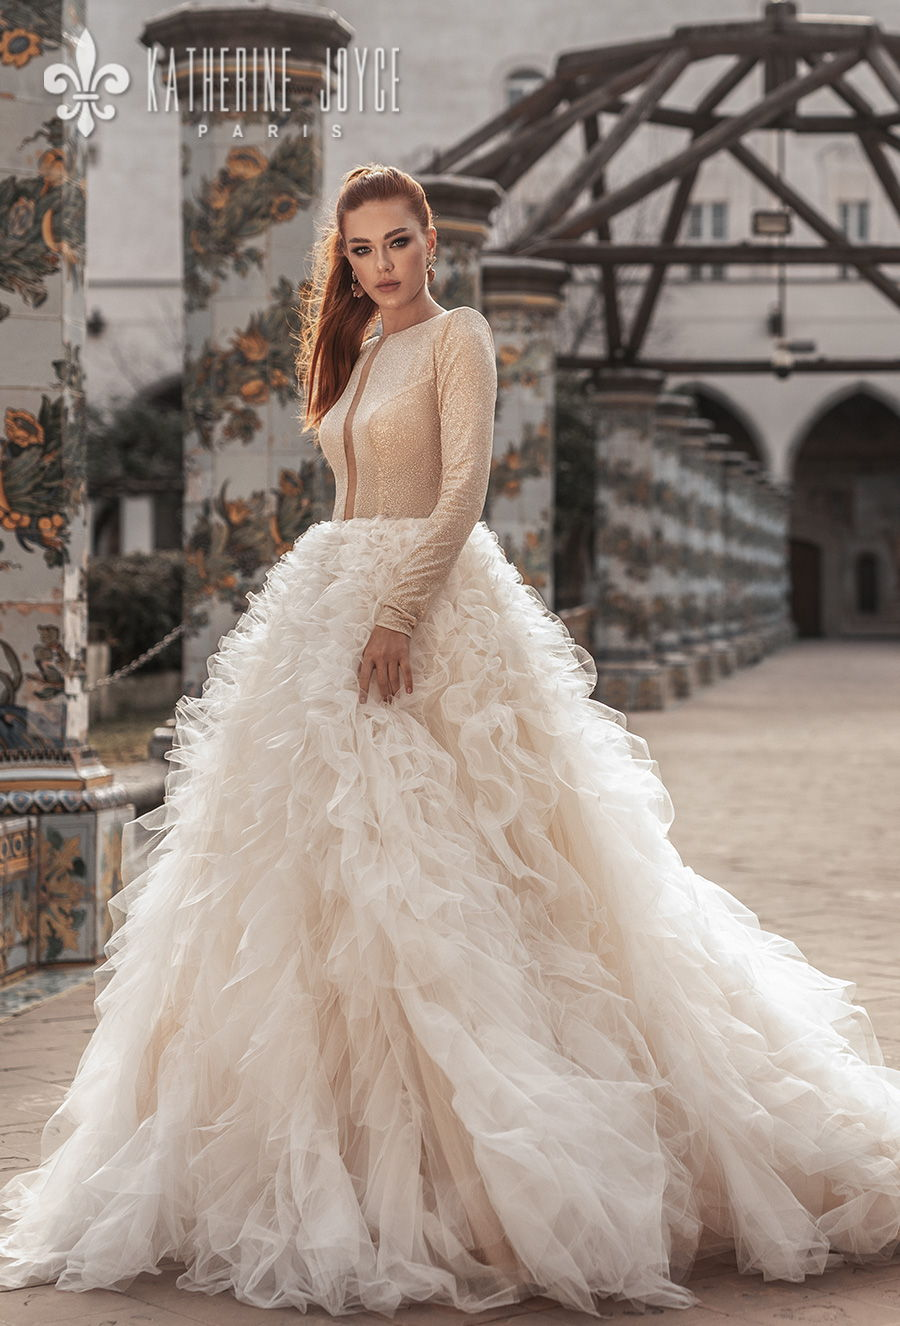 katherine joyce 2021 naples bridal long sleeves bateau neck light embellishment ruffled skirt glamorous a line wedding dress covered back chapel train (betanie) mv